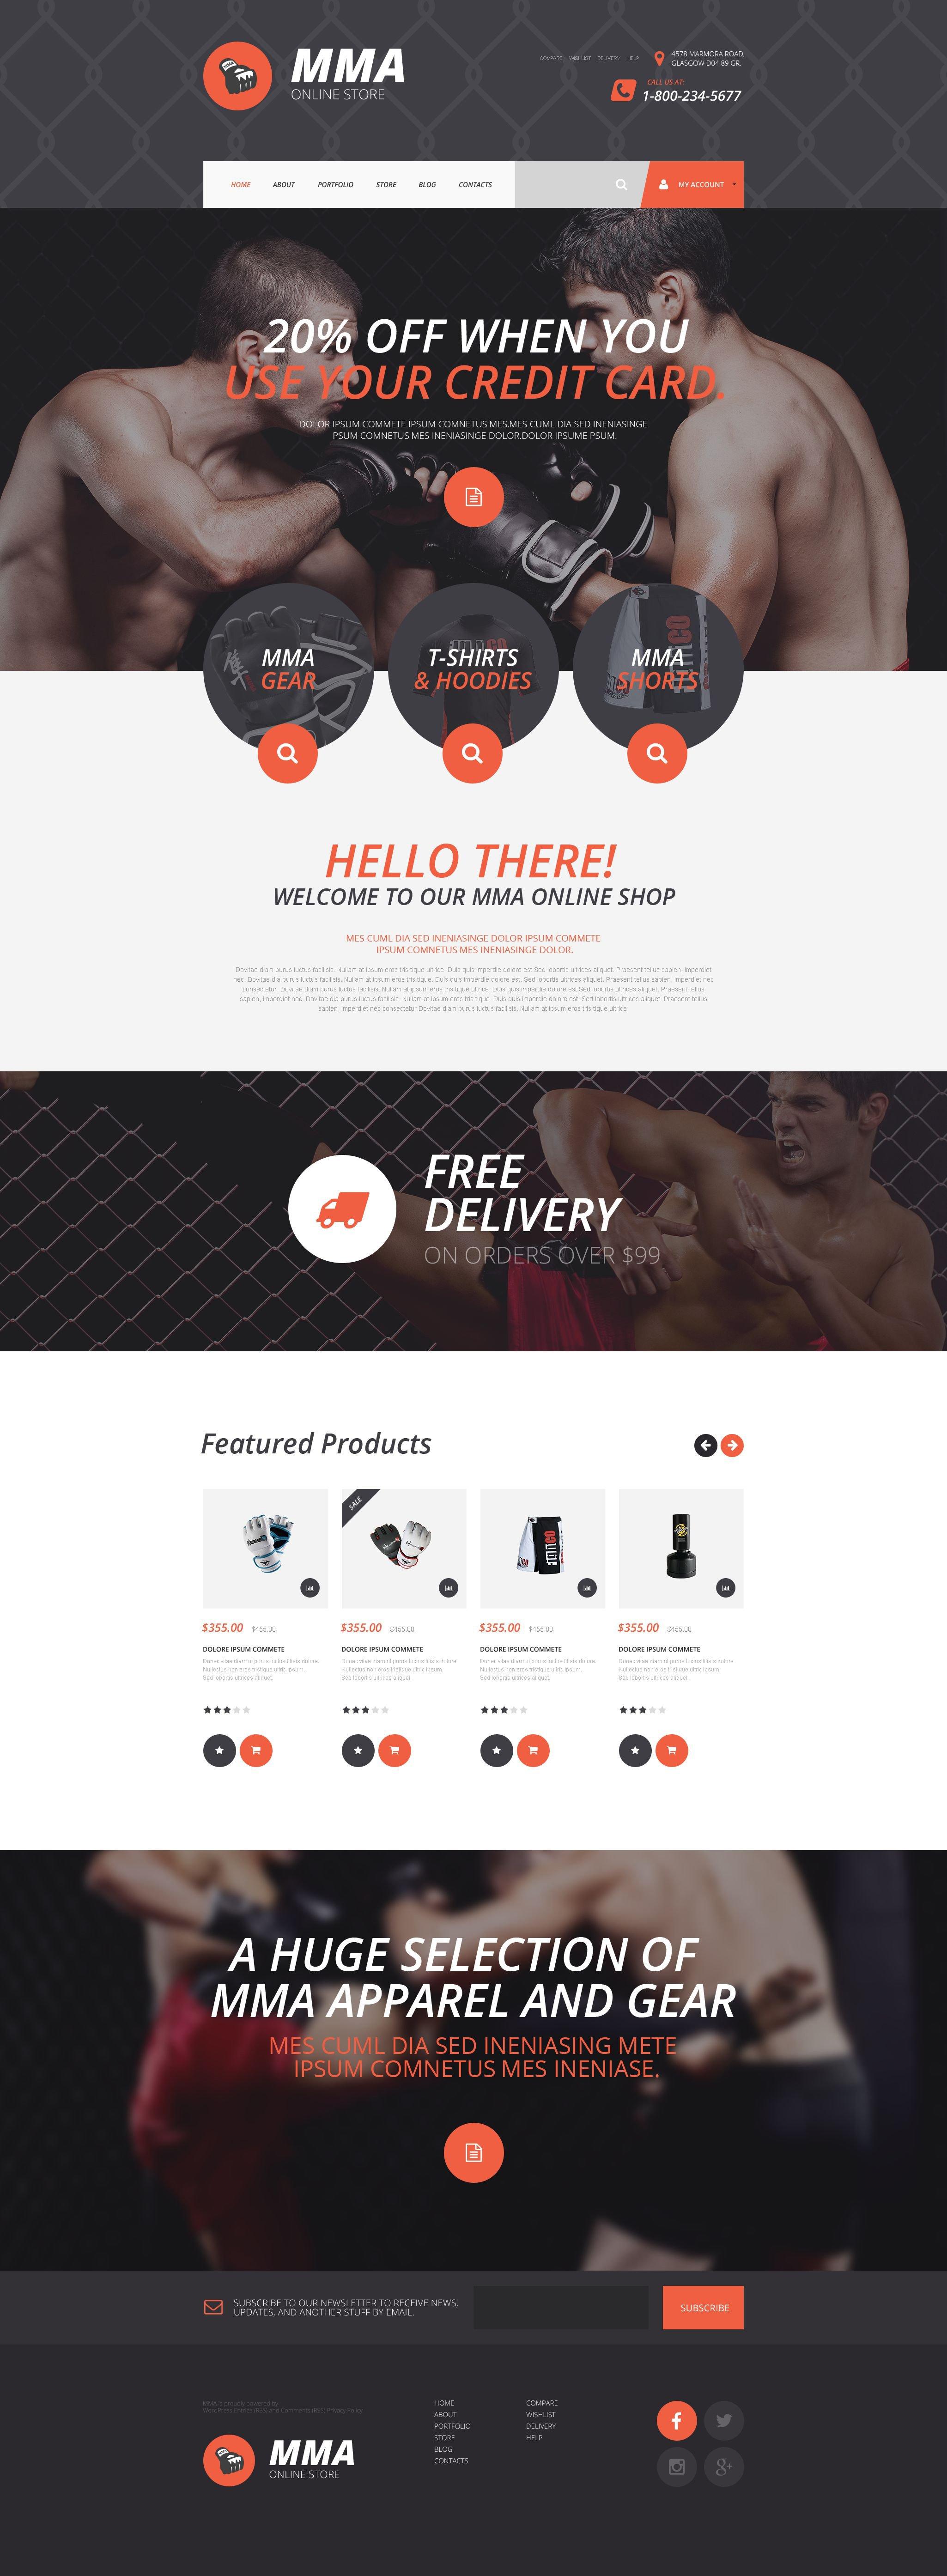 MMA Online Store WooCommerce Theme - screenshot